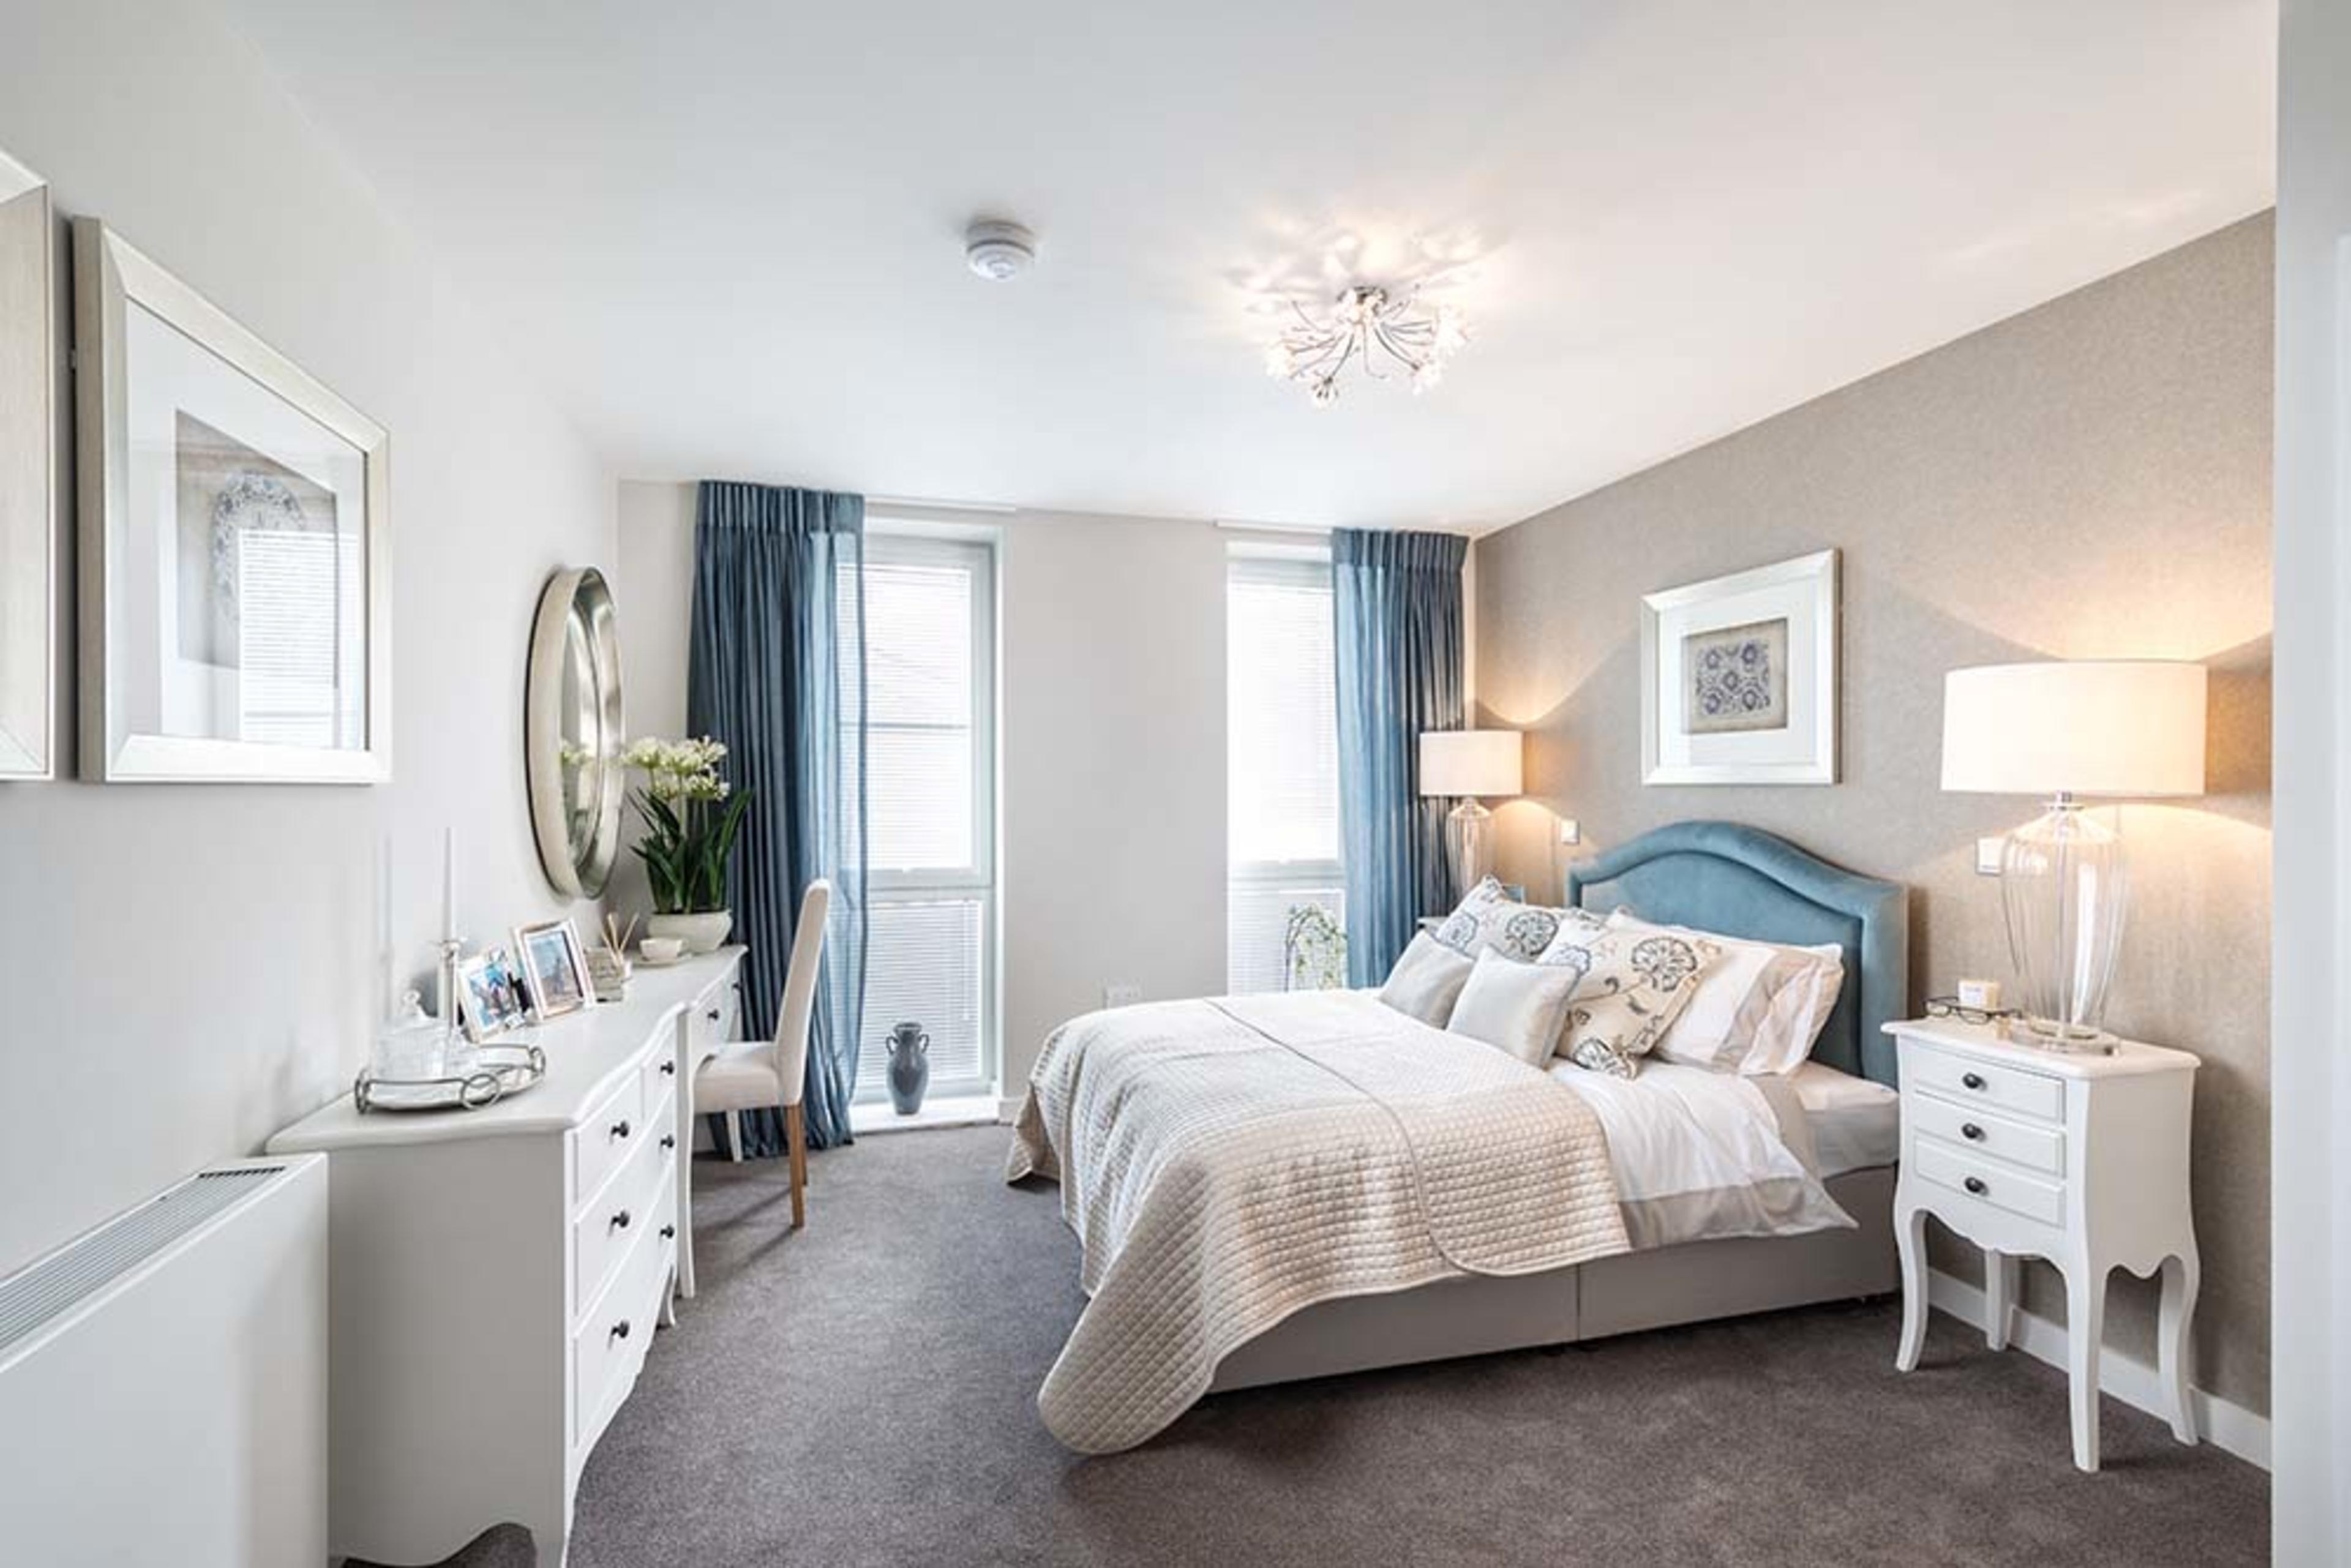 Huntley Place - Master bedroom